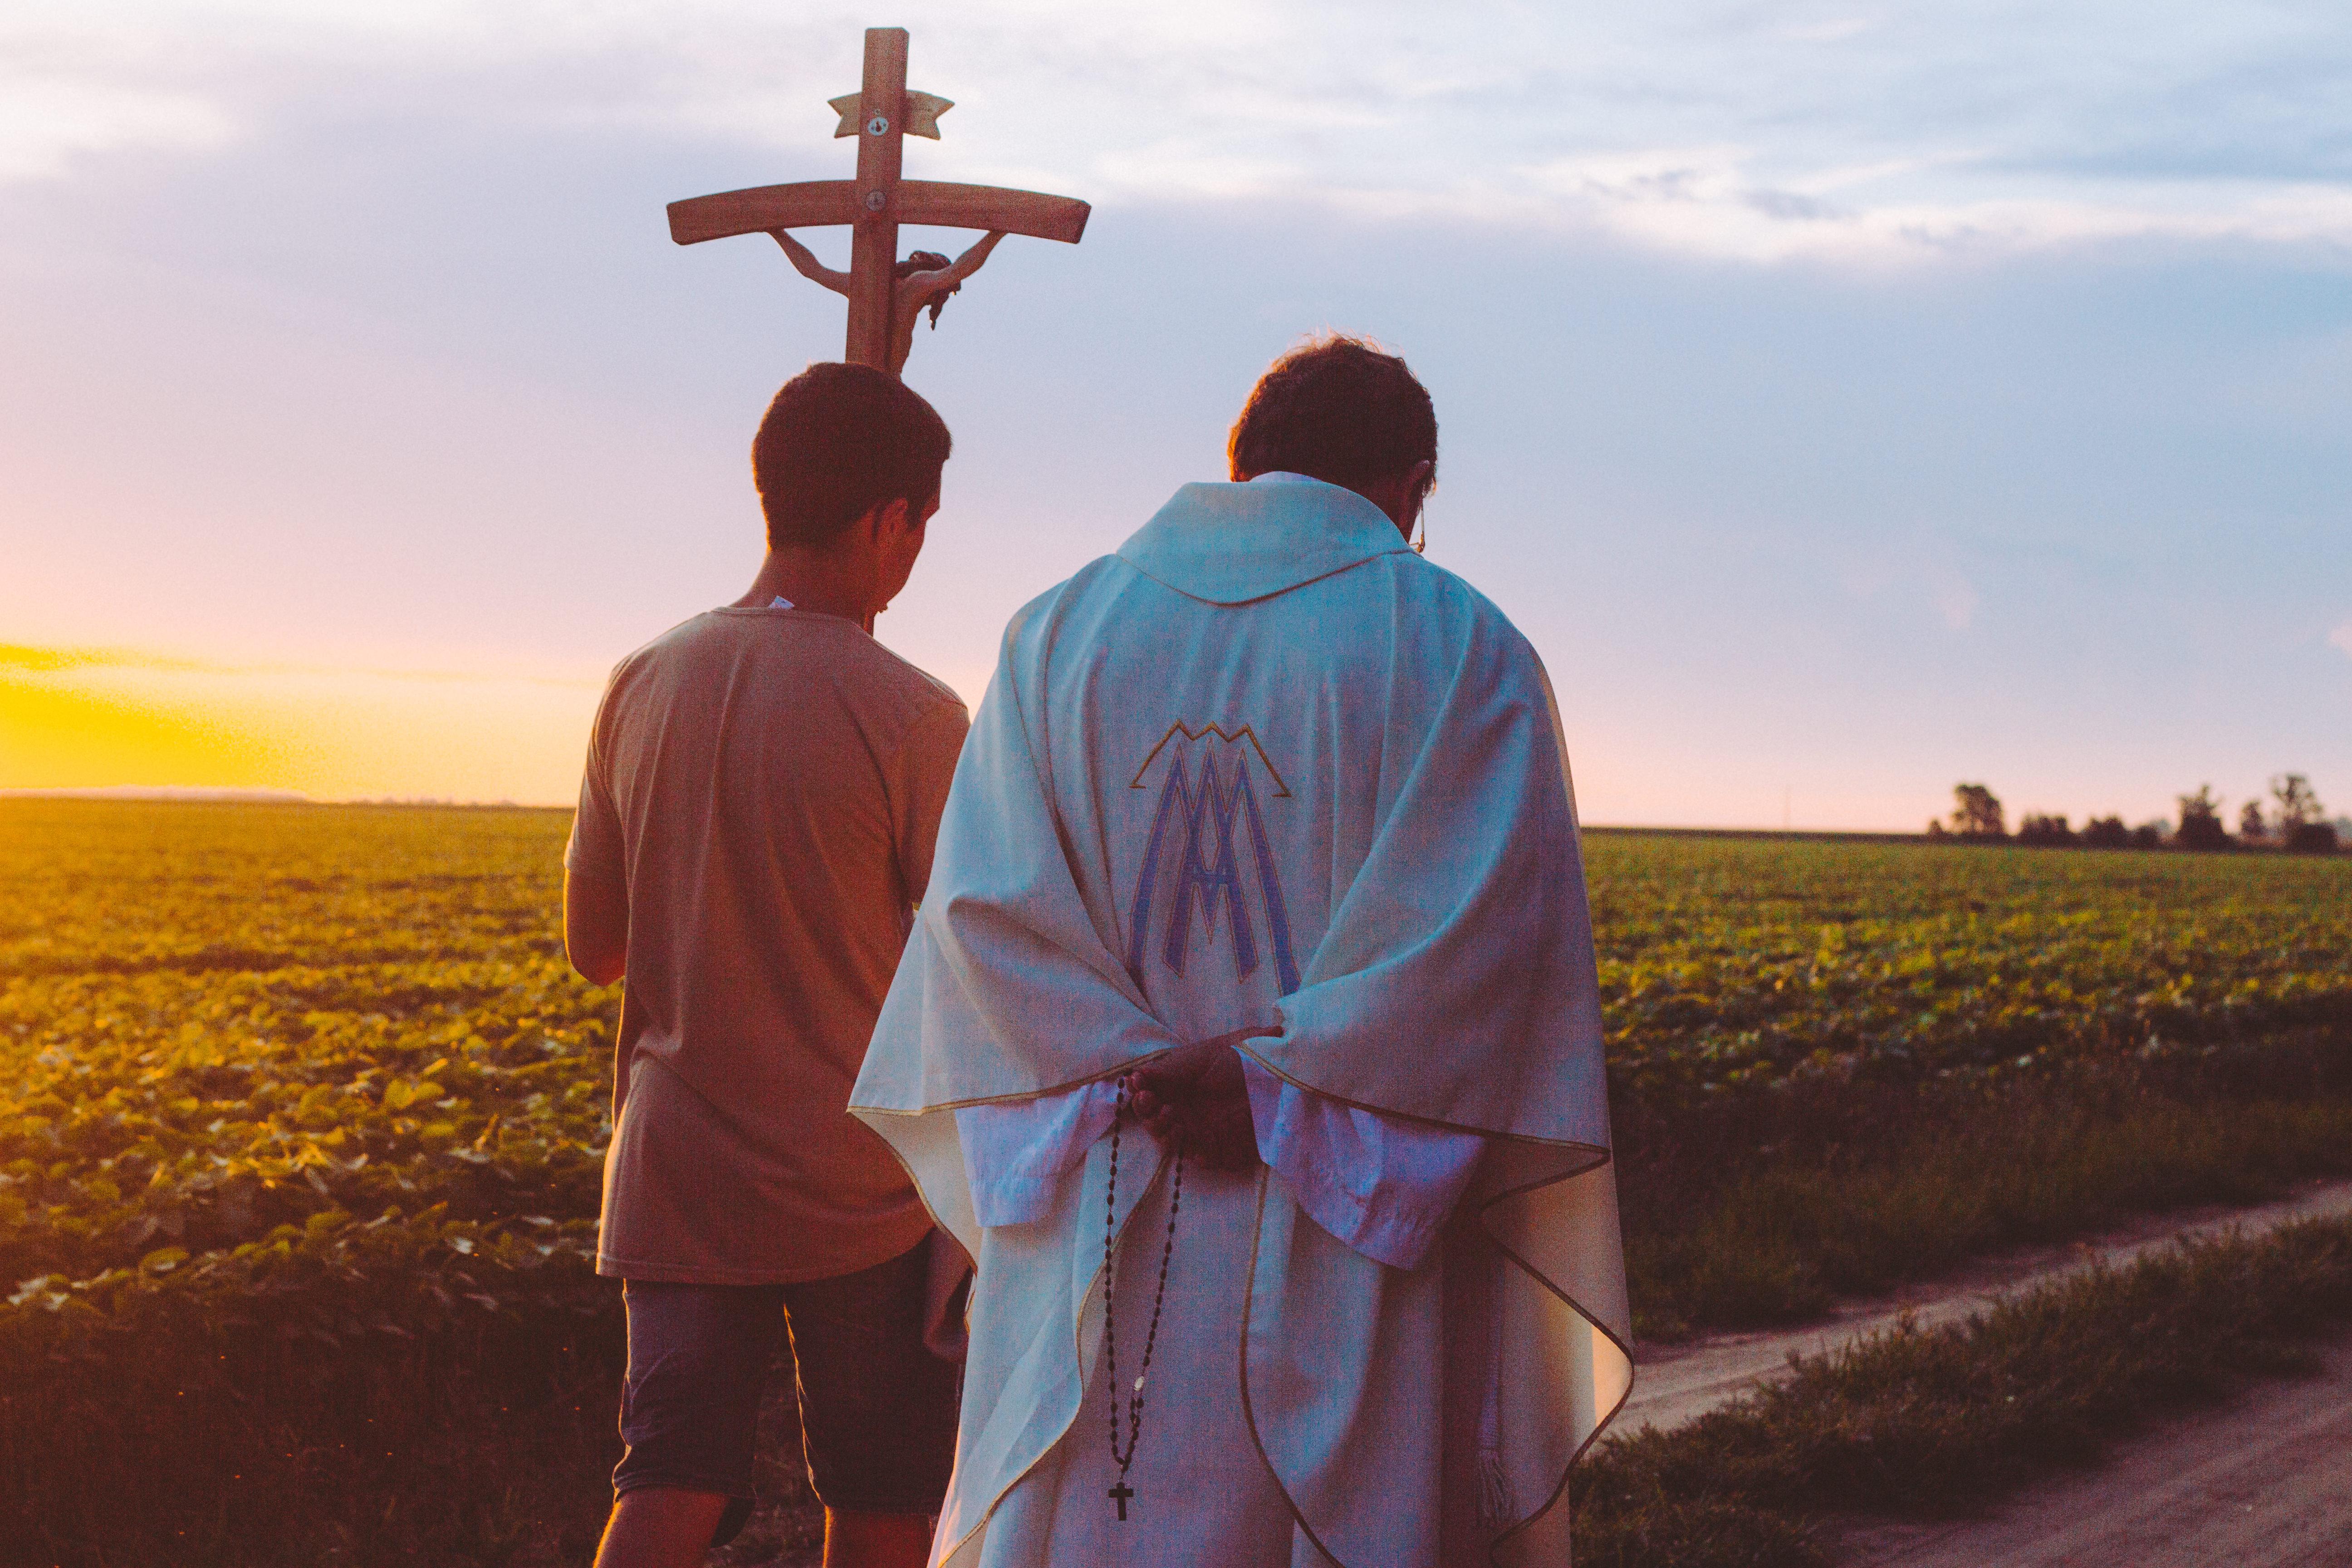 Un sacerdote habla con un chico joven © Cathopic